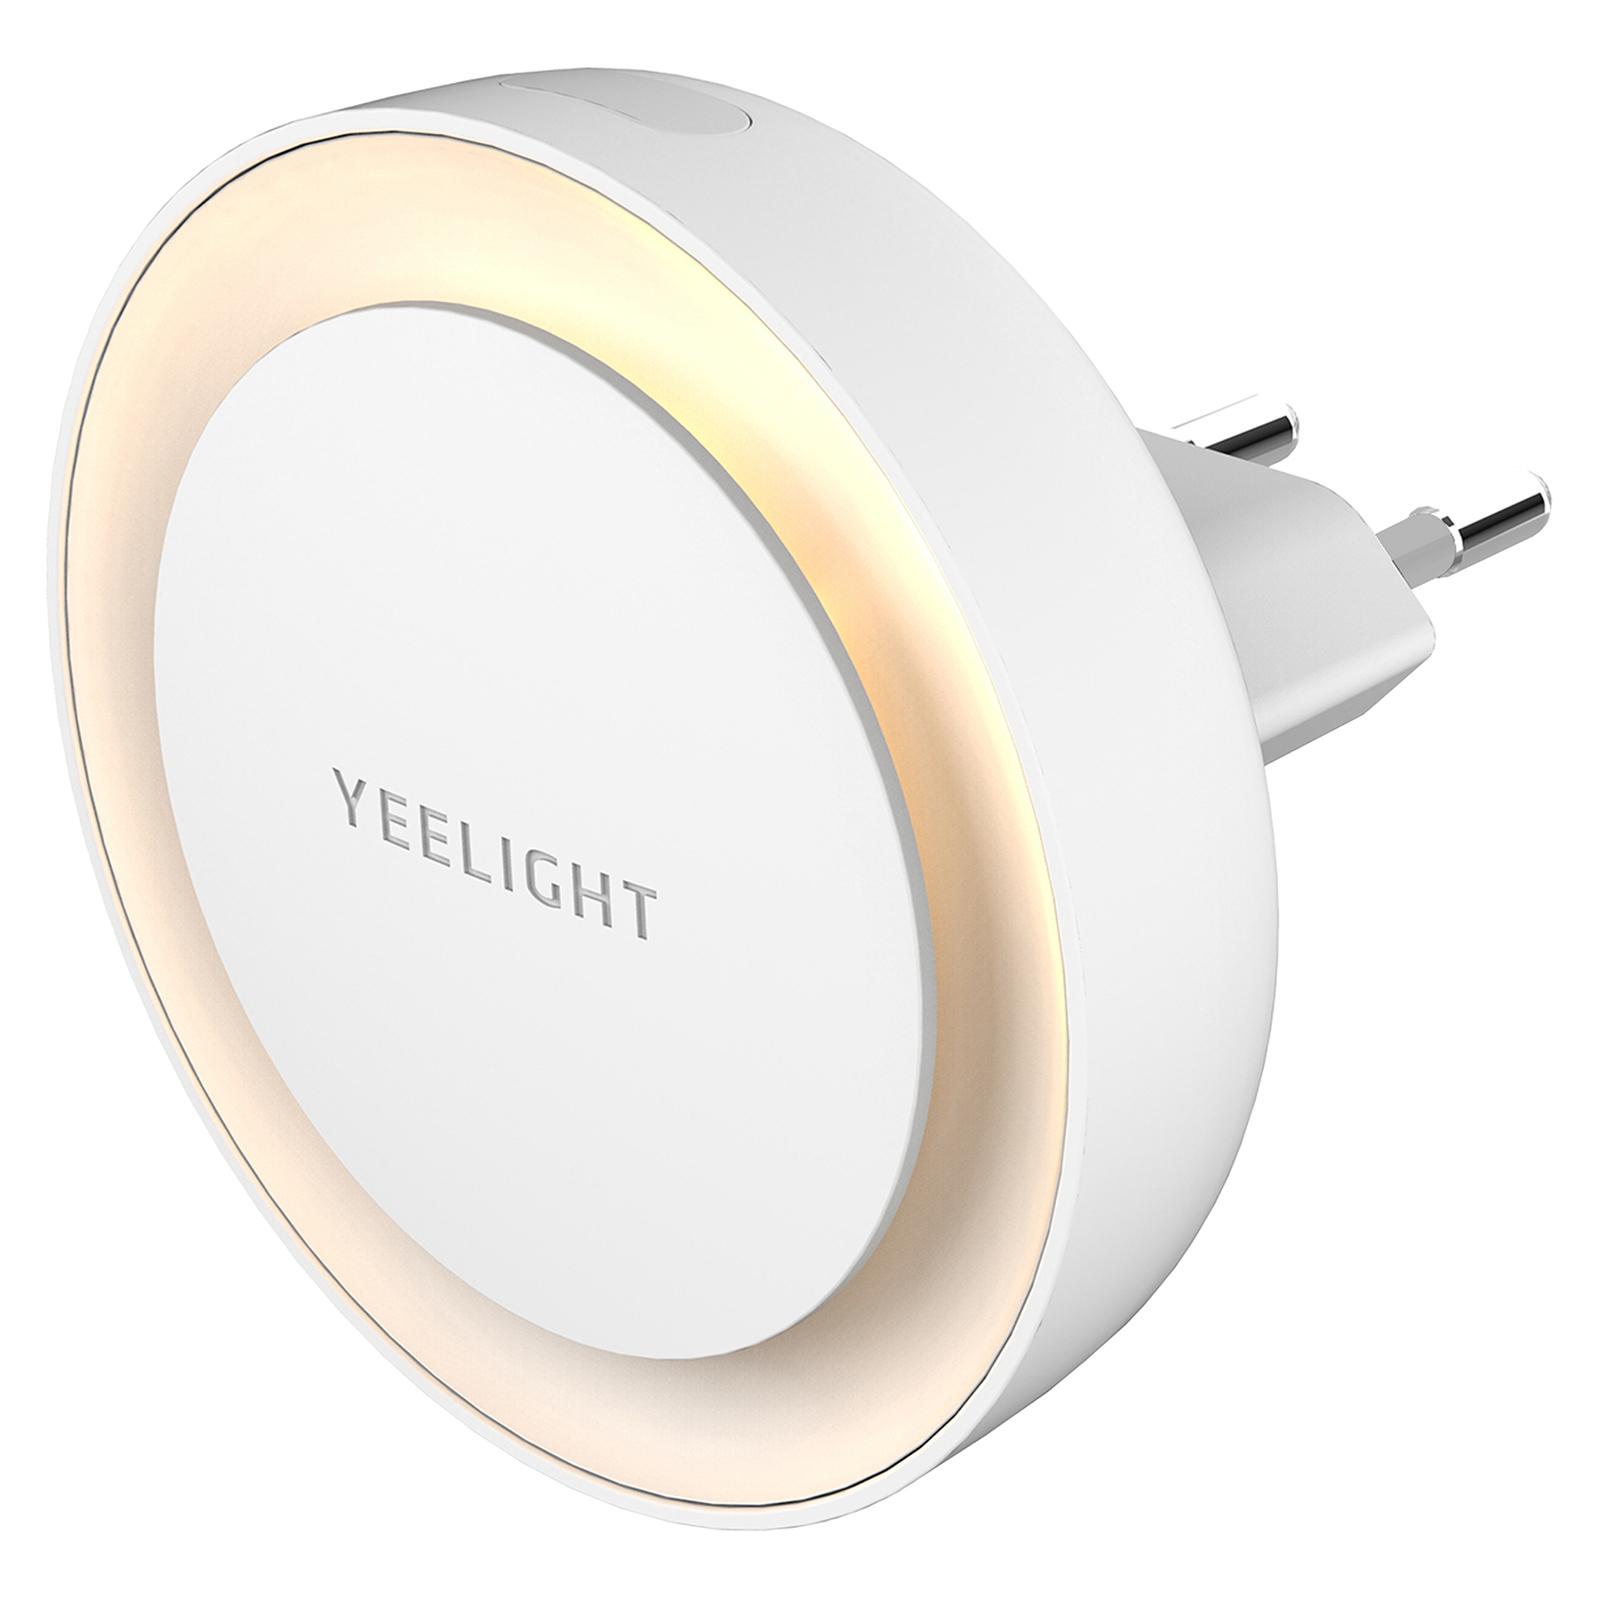 Yeelight luce notturna a sensore per la presa